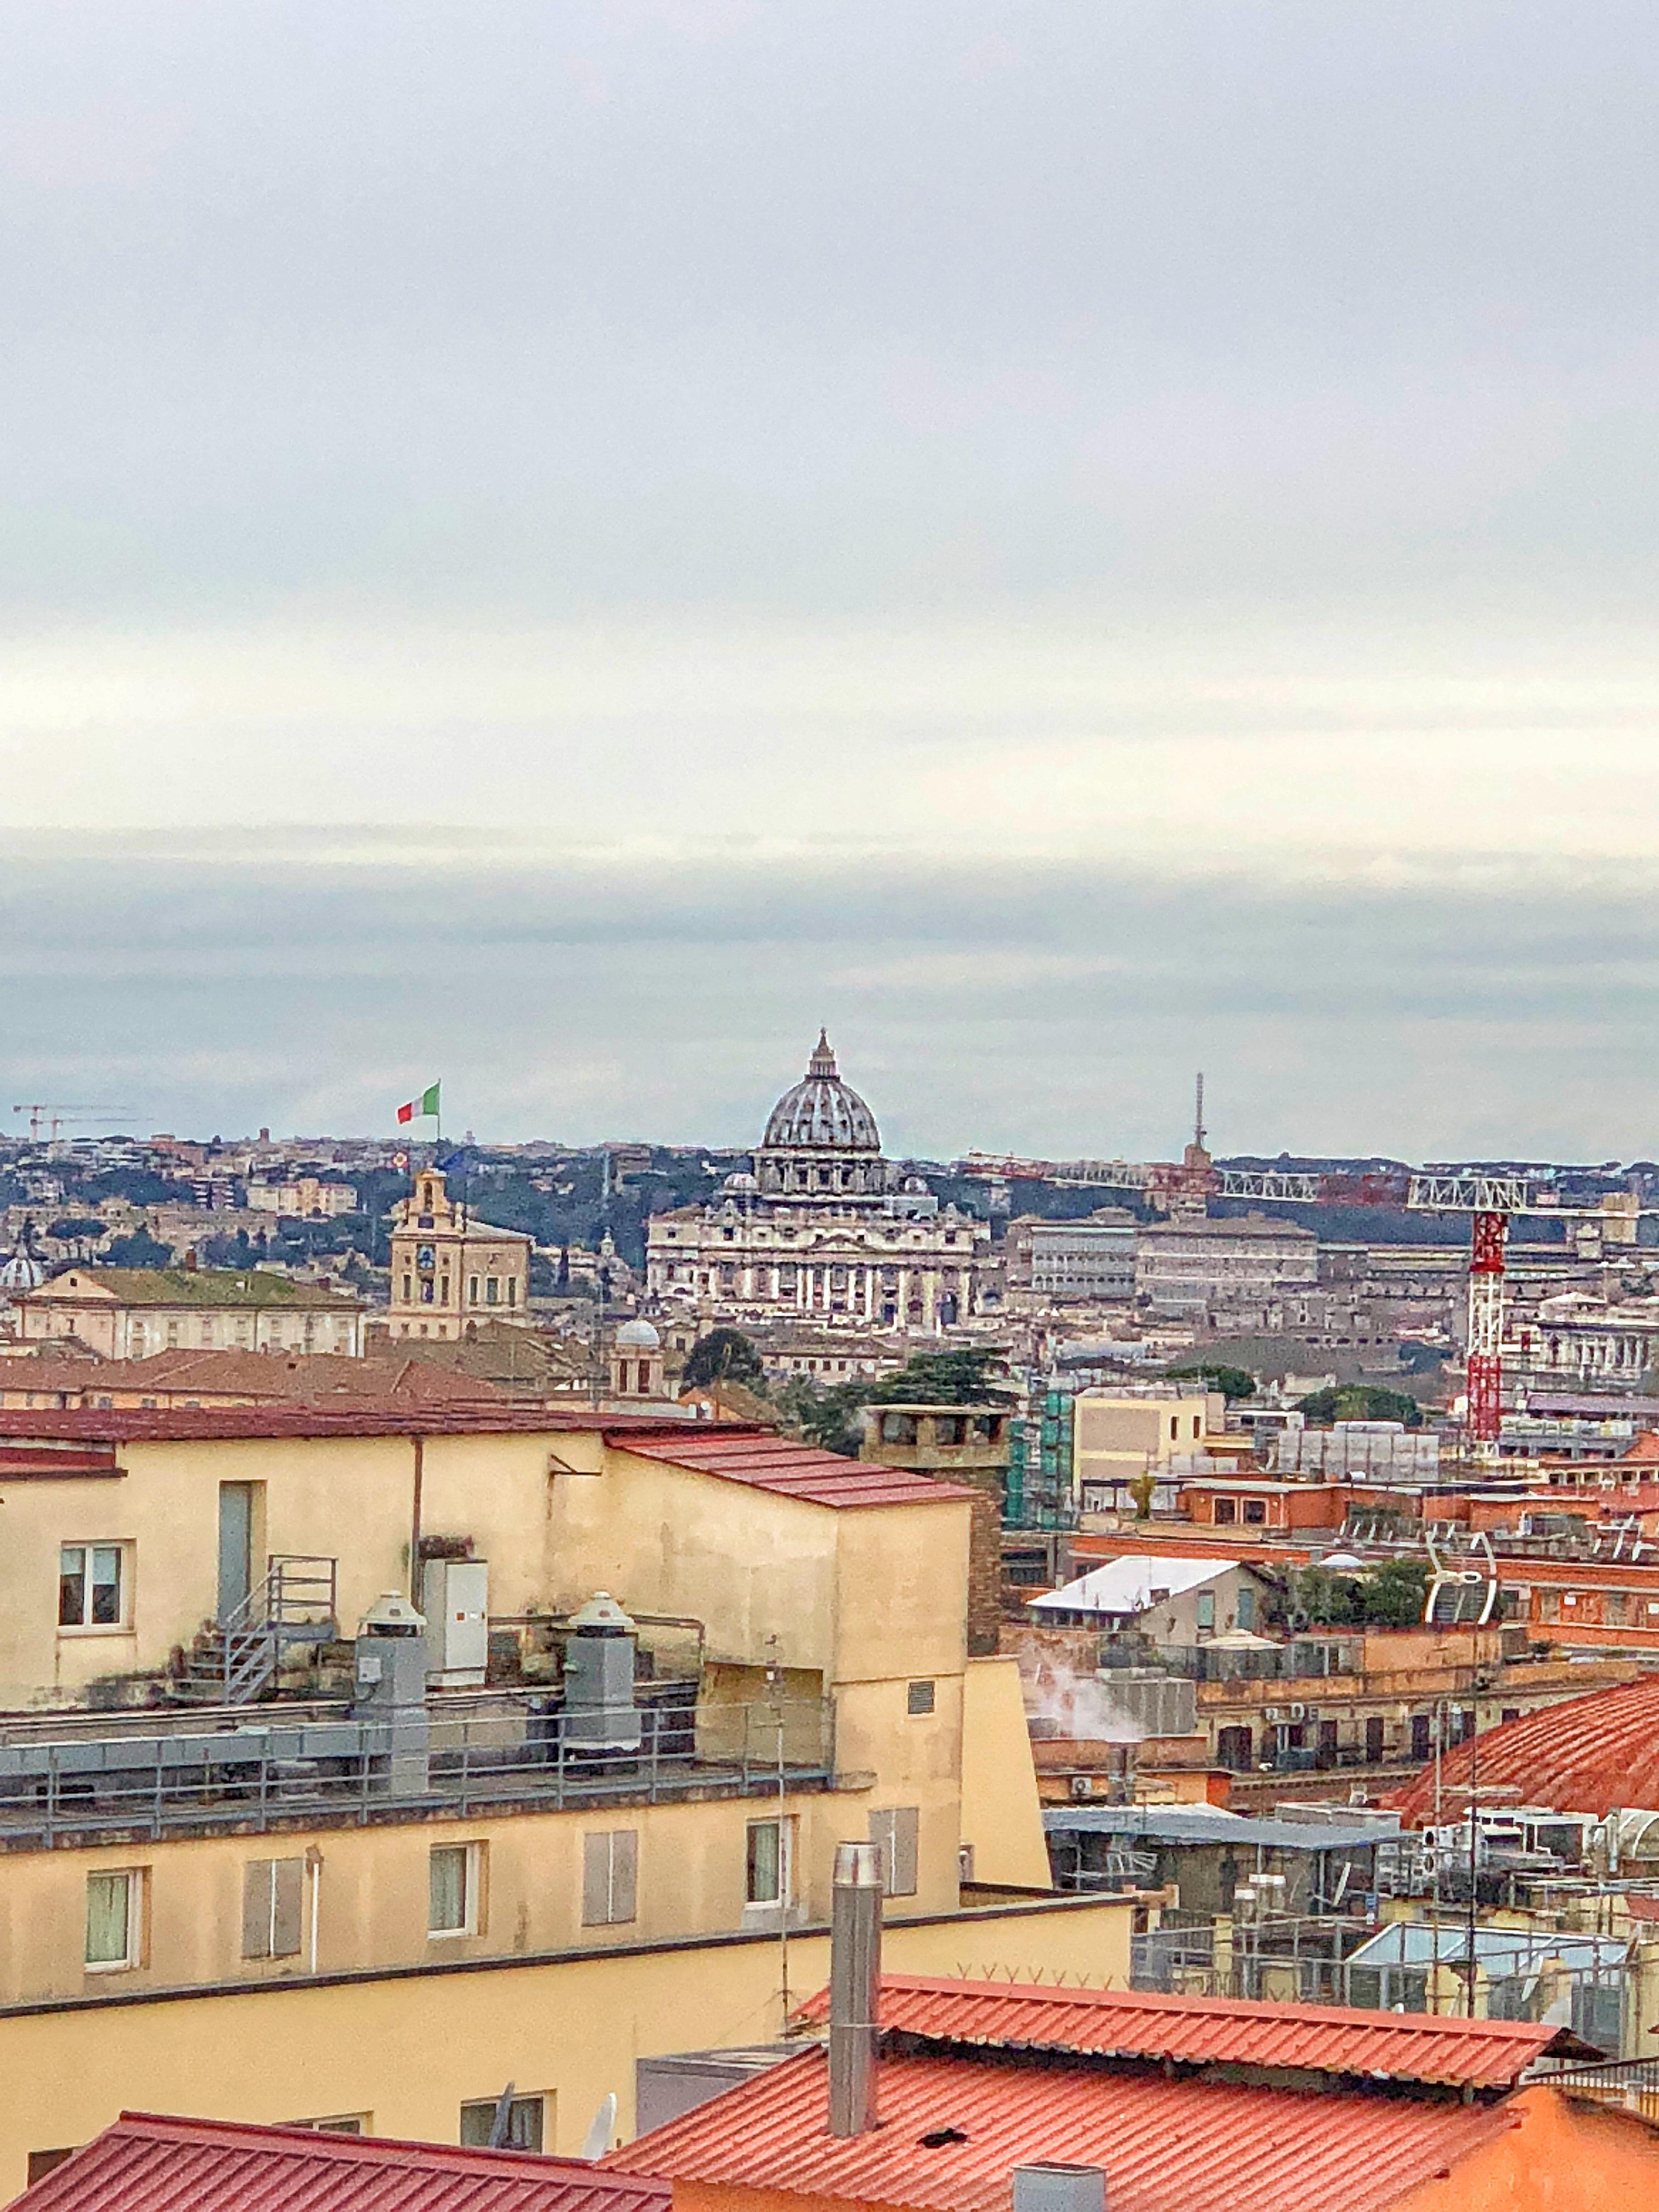 BETTOJA HOTEL MEDITERRANEO LIFE IN ROME